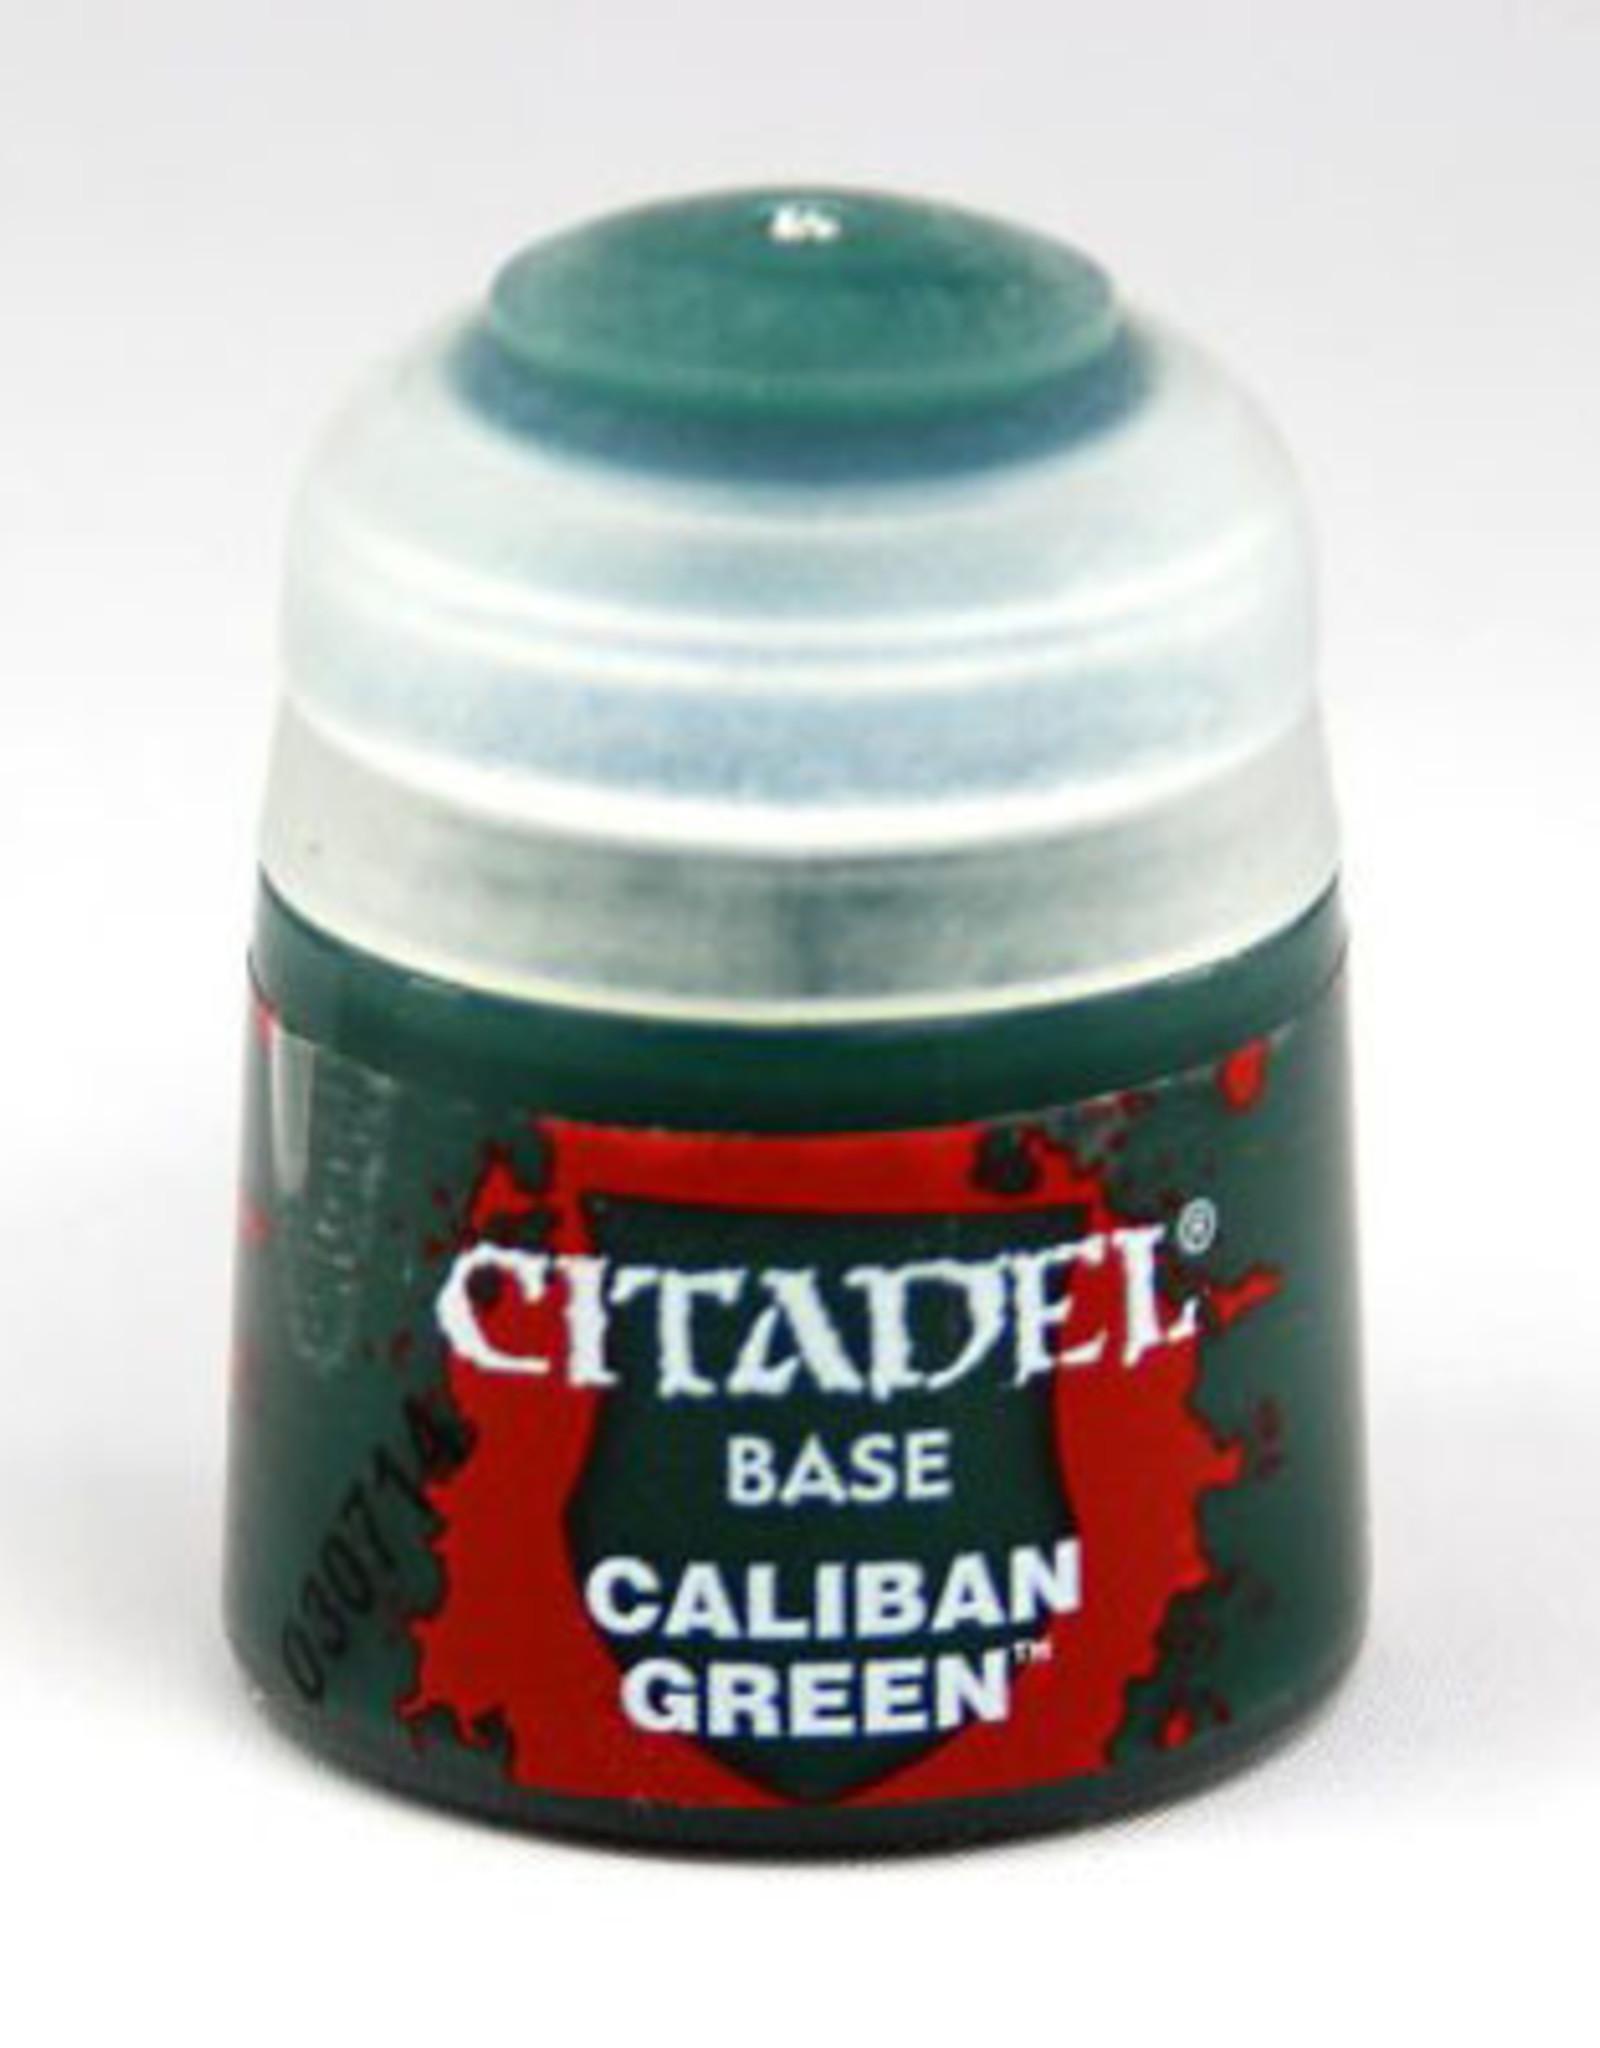 Games Workshop Citadel Paint: Base - Caliban Green